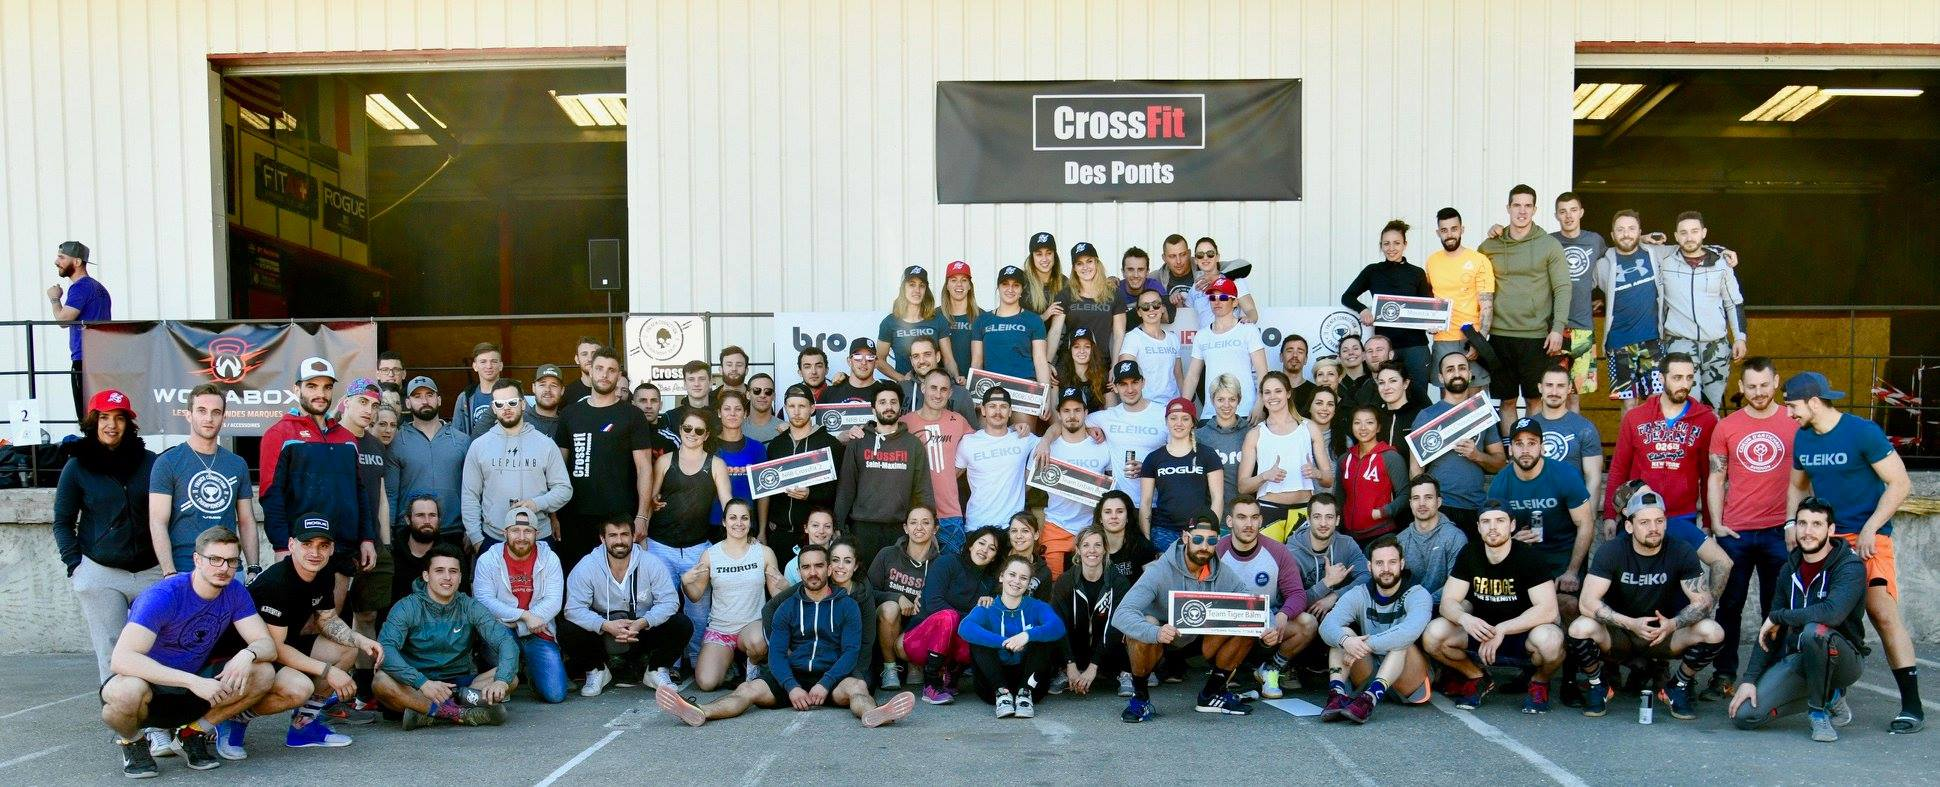 French Co Championship @ CrossFit Des Ponts #CFDP